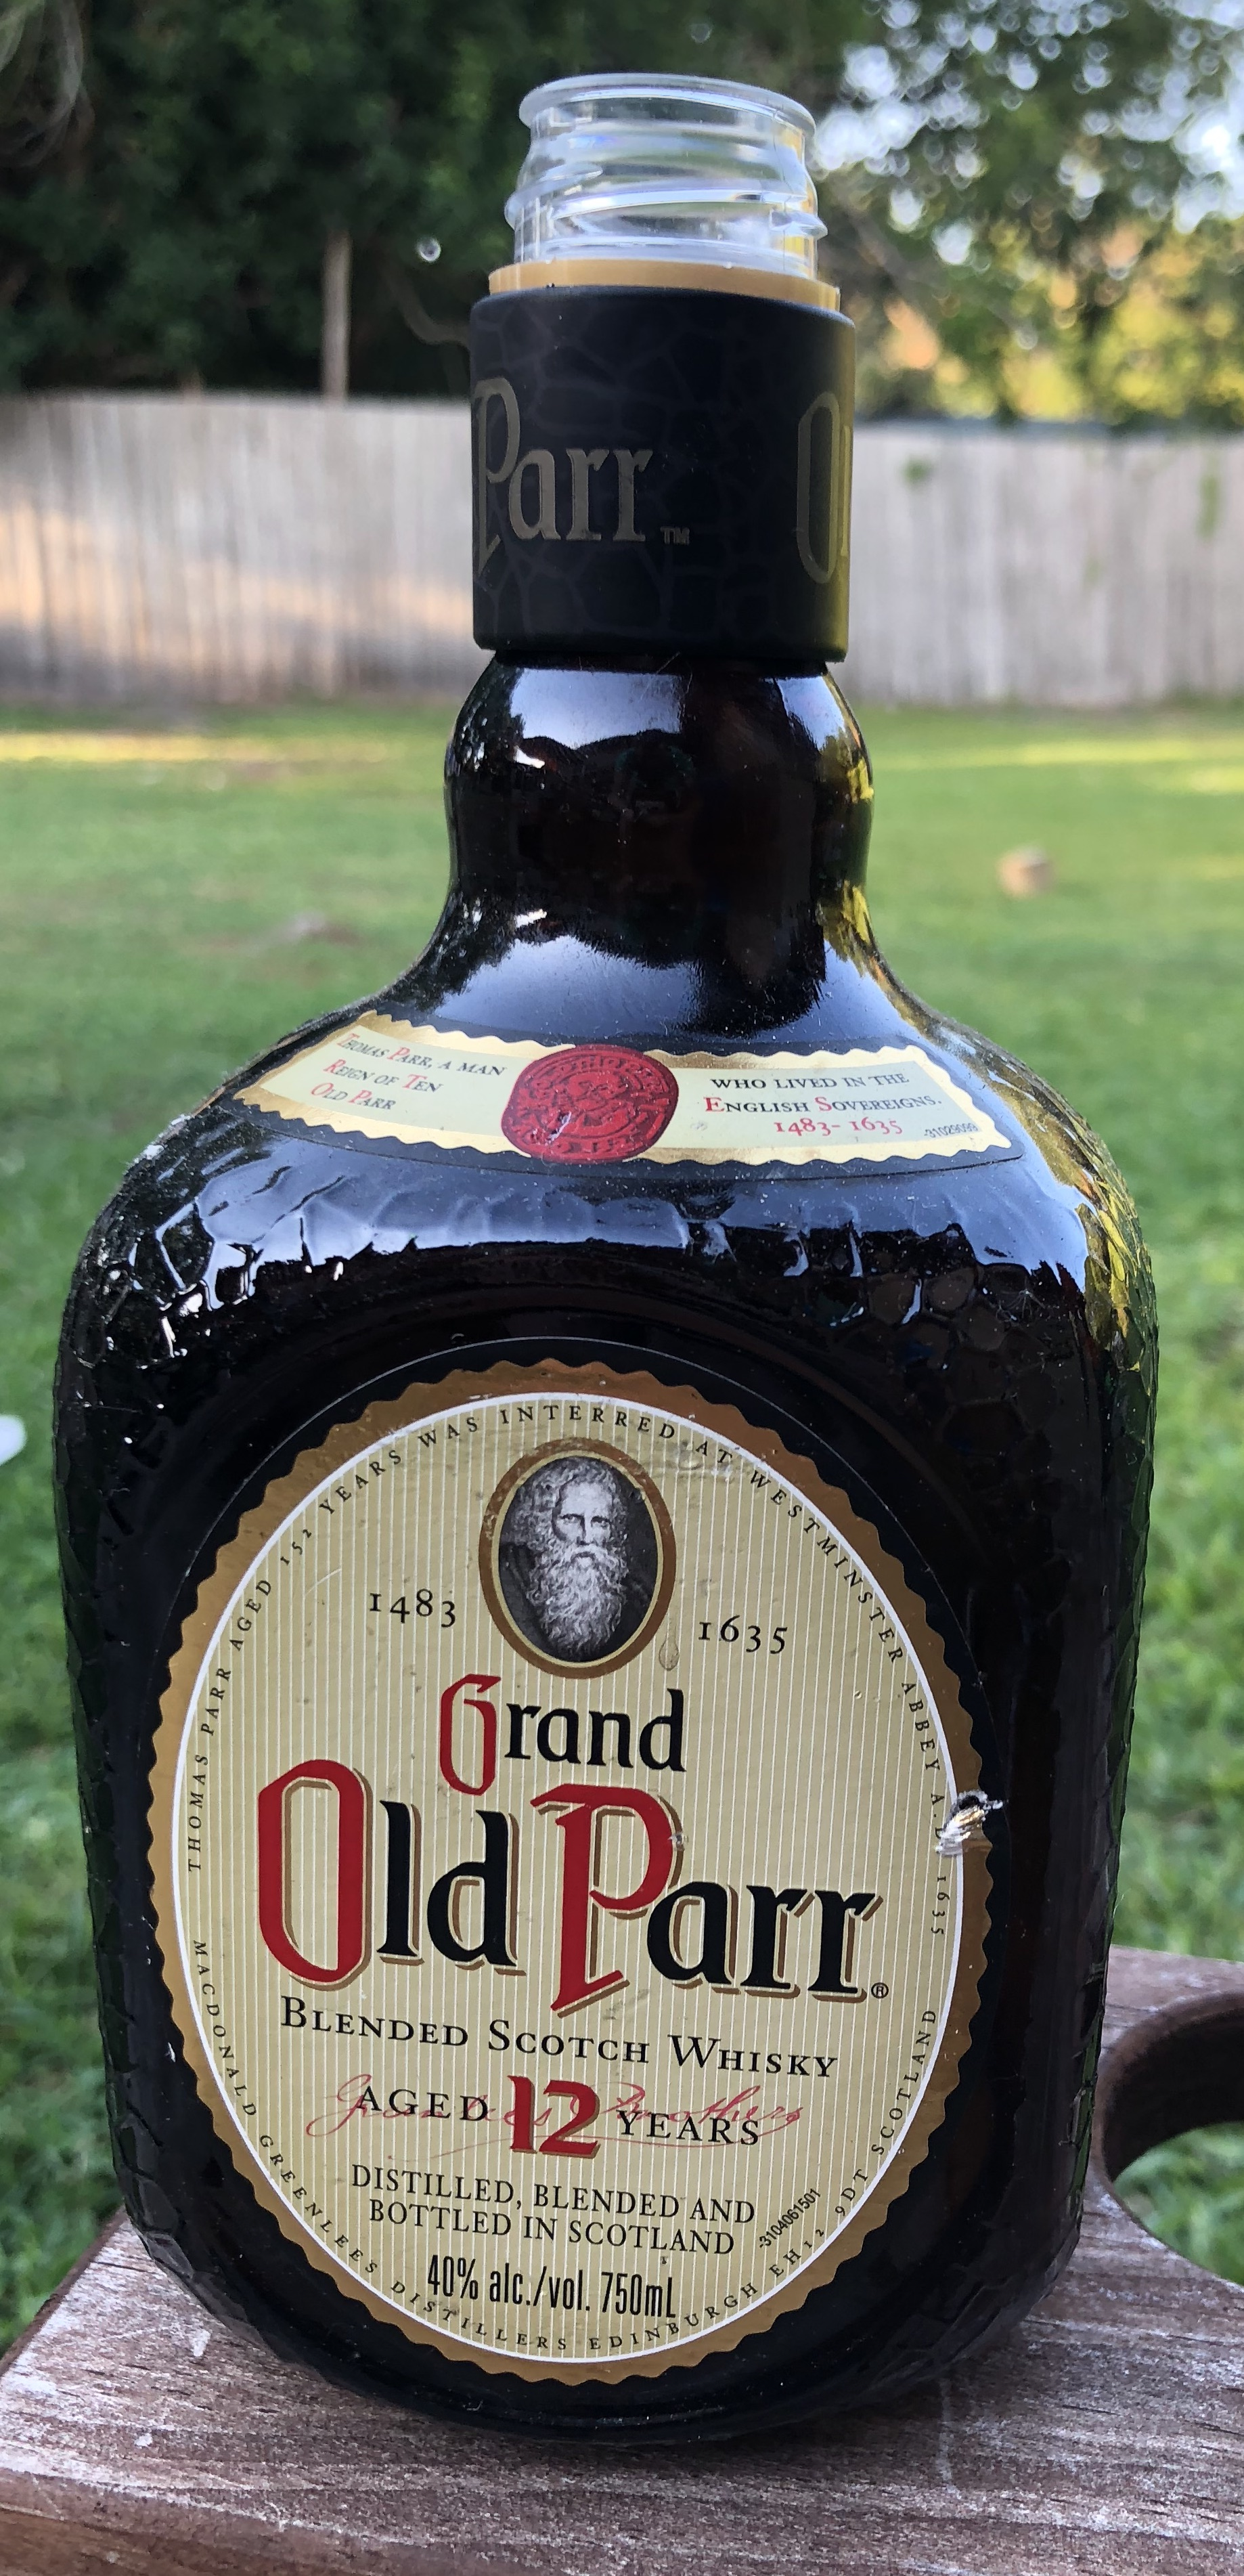 Grand Old Parr.jpg